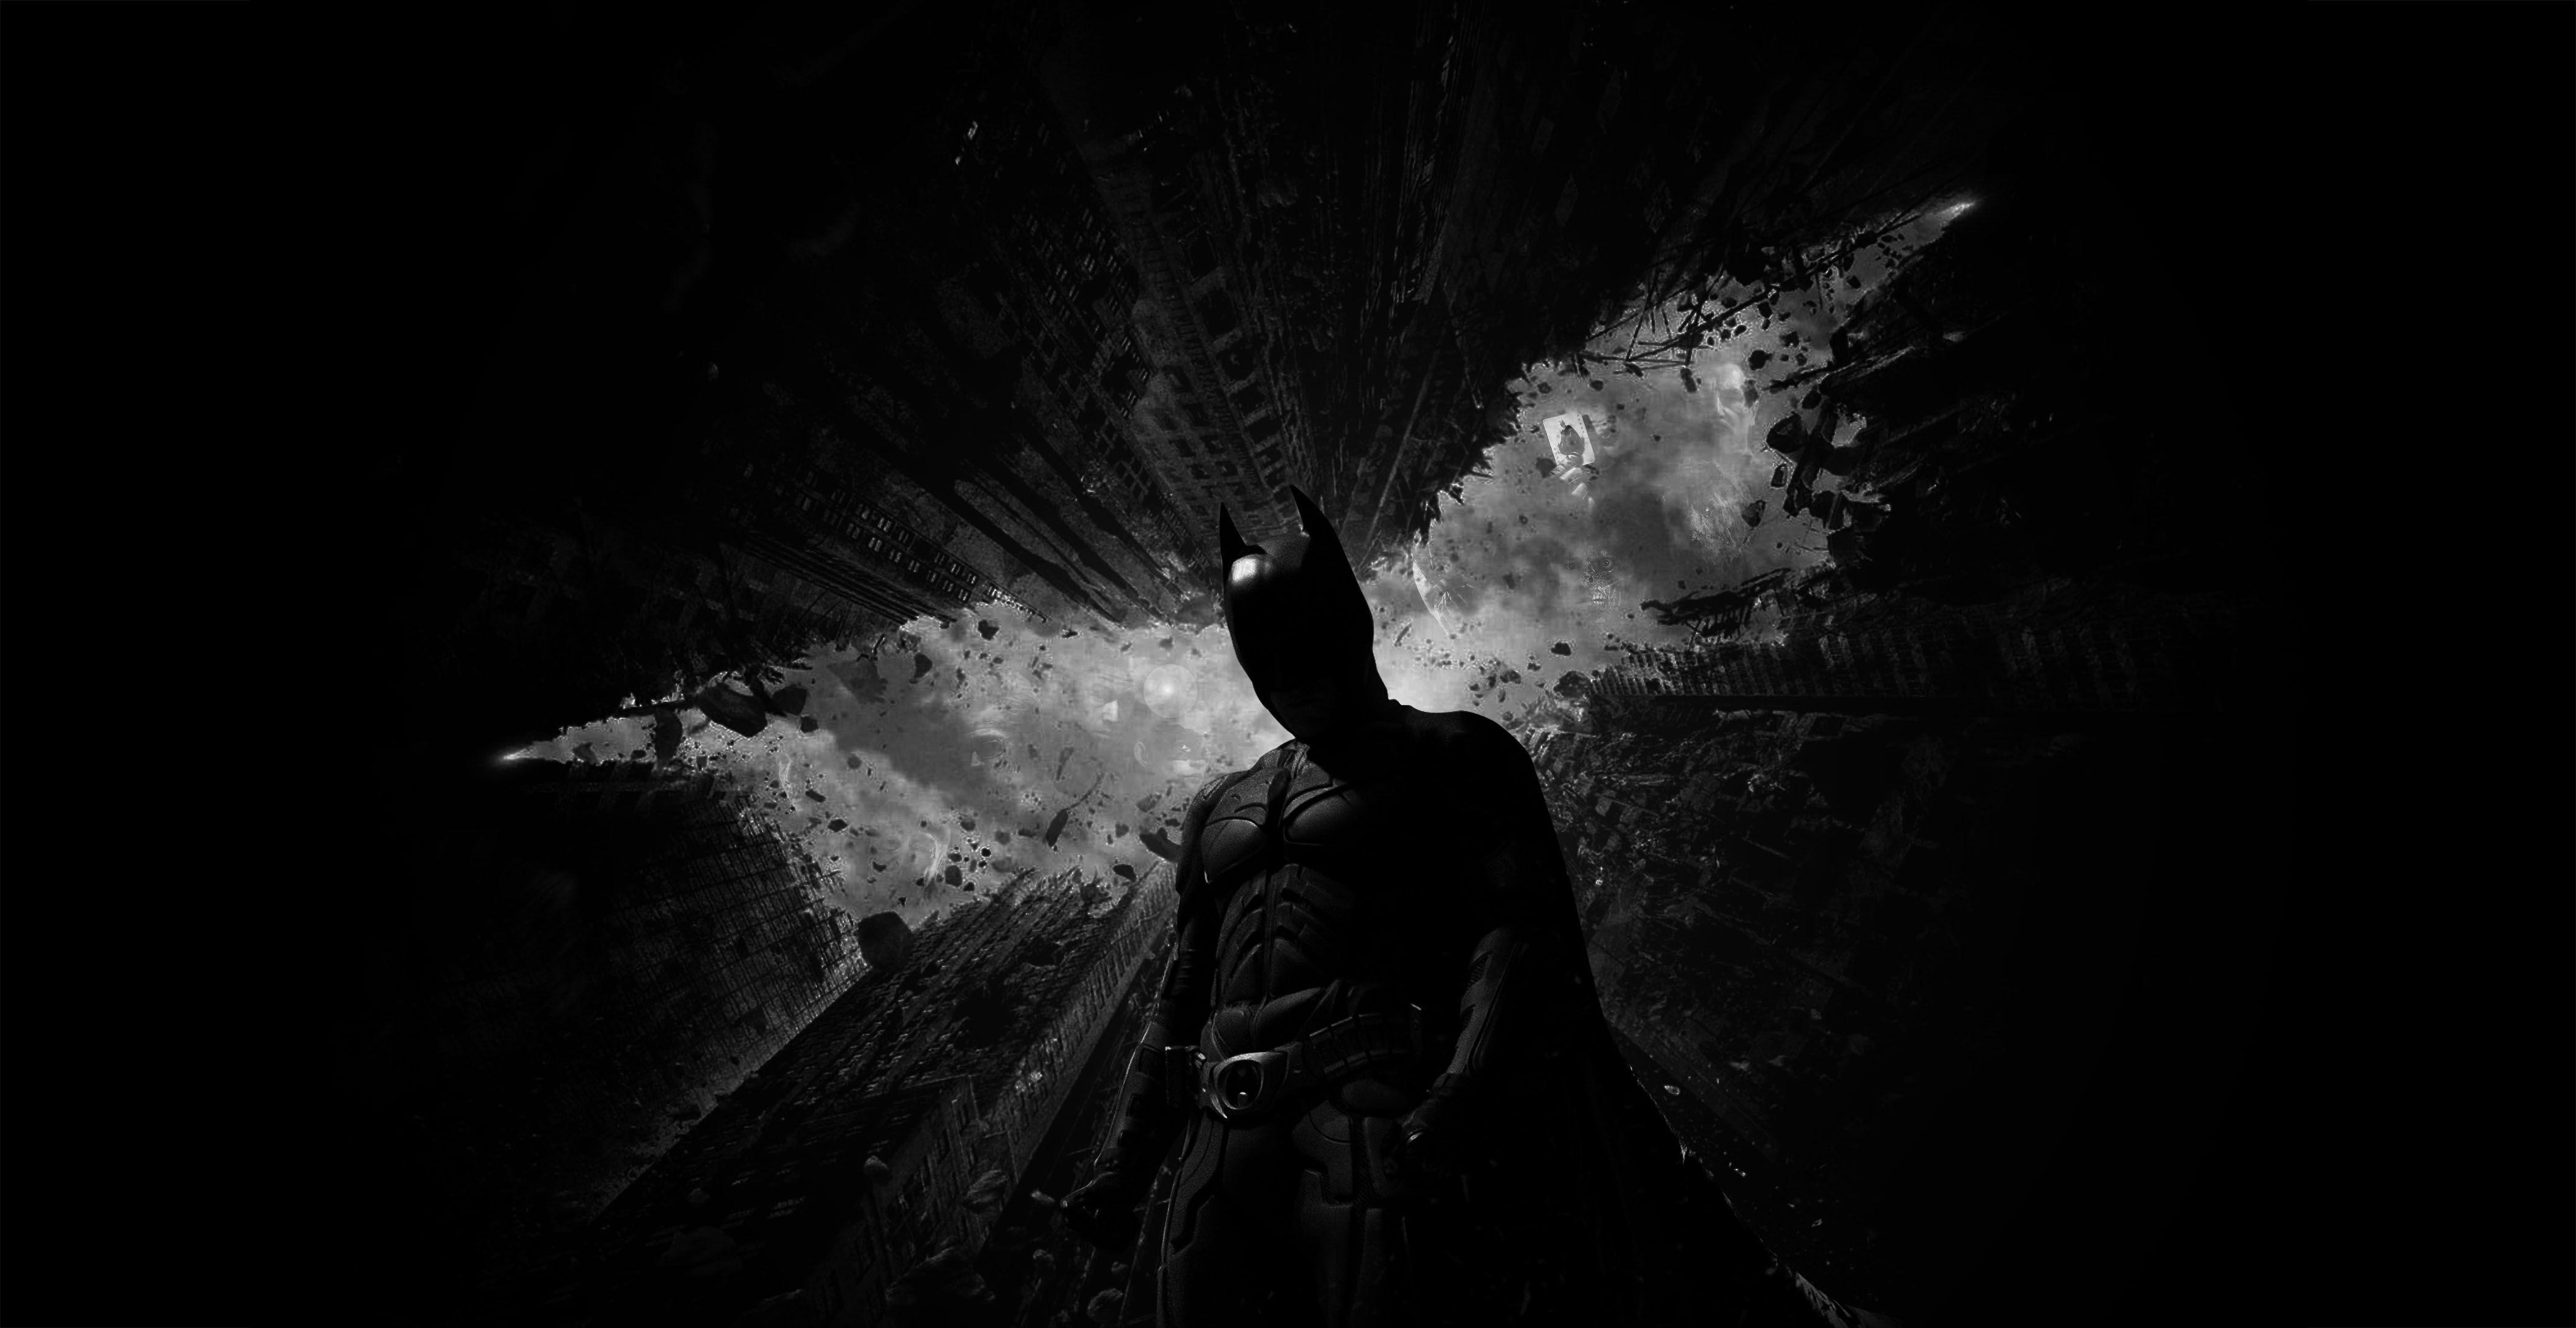 Wallpaper Dark Night Silhouette Batman The Dark Knight Rises Christian Bale Light Darkness Black And White Monochrome Photography 4208x2170 Maharaj 56876 Hd Wallpapers Wallhere